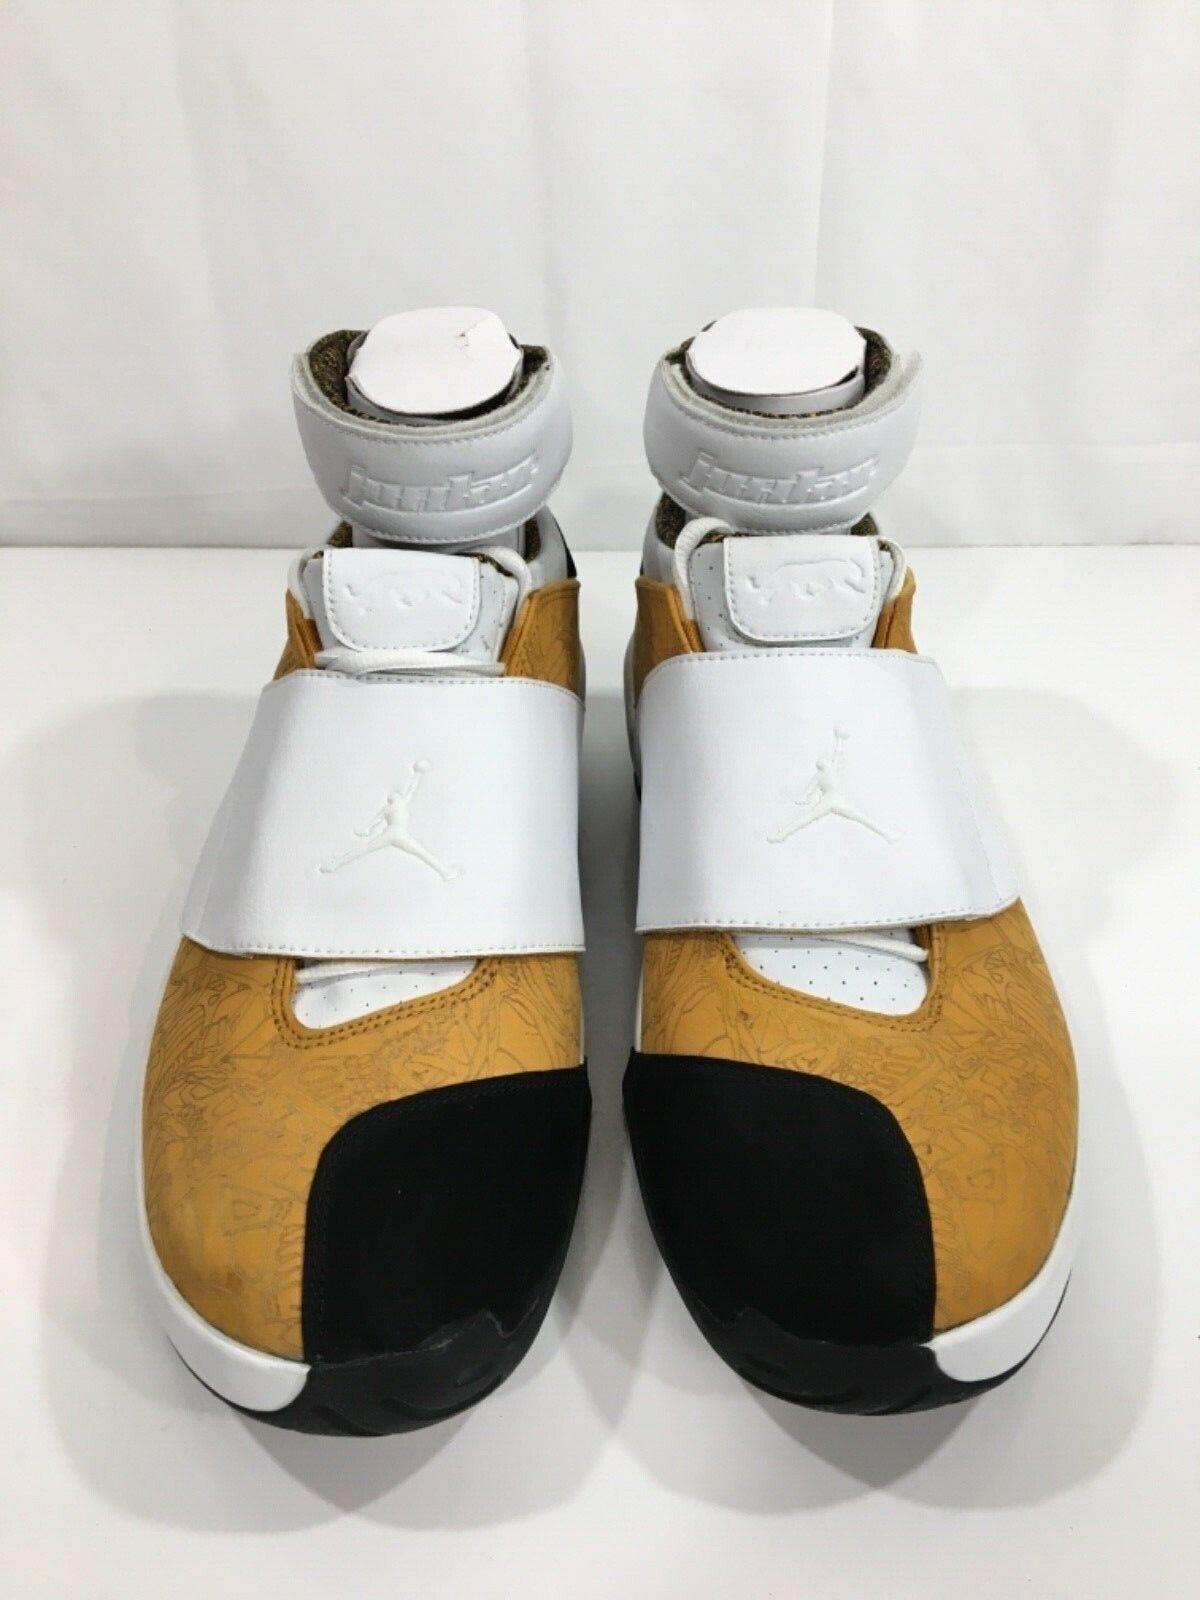 NIB VNDS VTG Collectible OG 2005 Nike Air Jordan XX (20) Chutney White Black 12